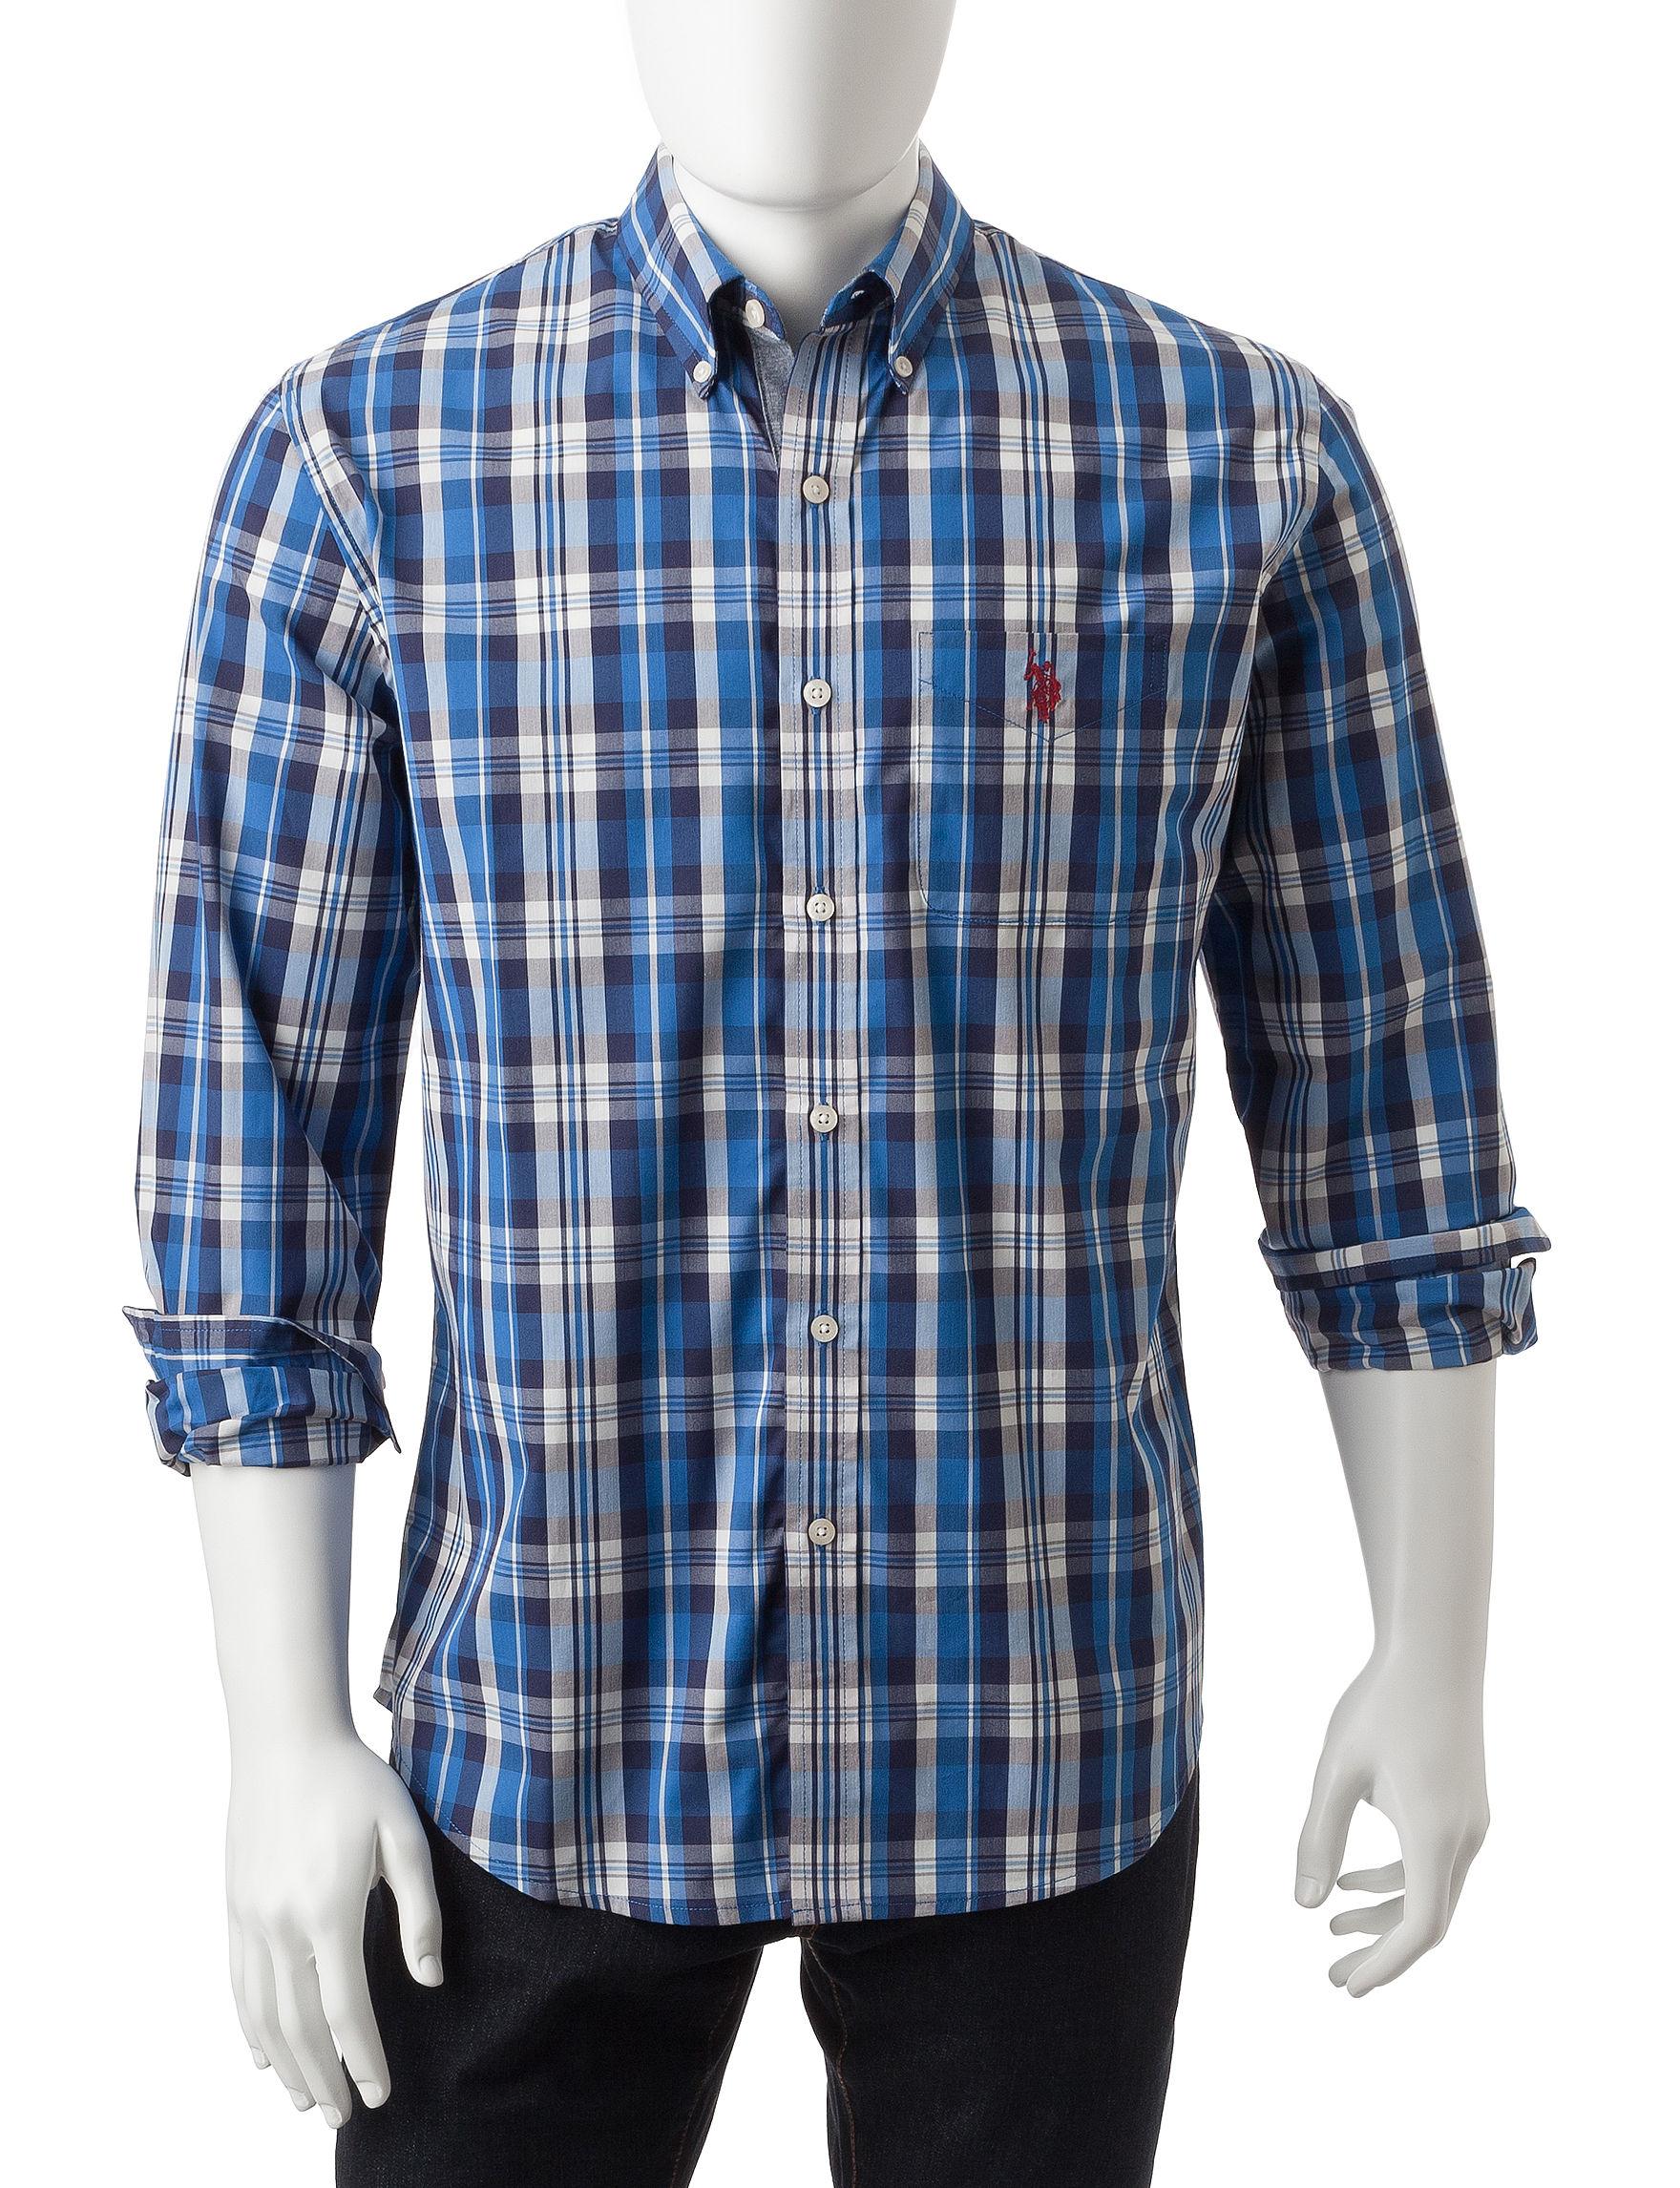 U.S. Polo Assn. Navy Casual Button Down Shirts Classic